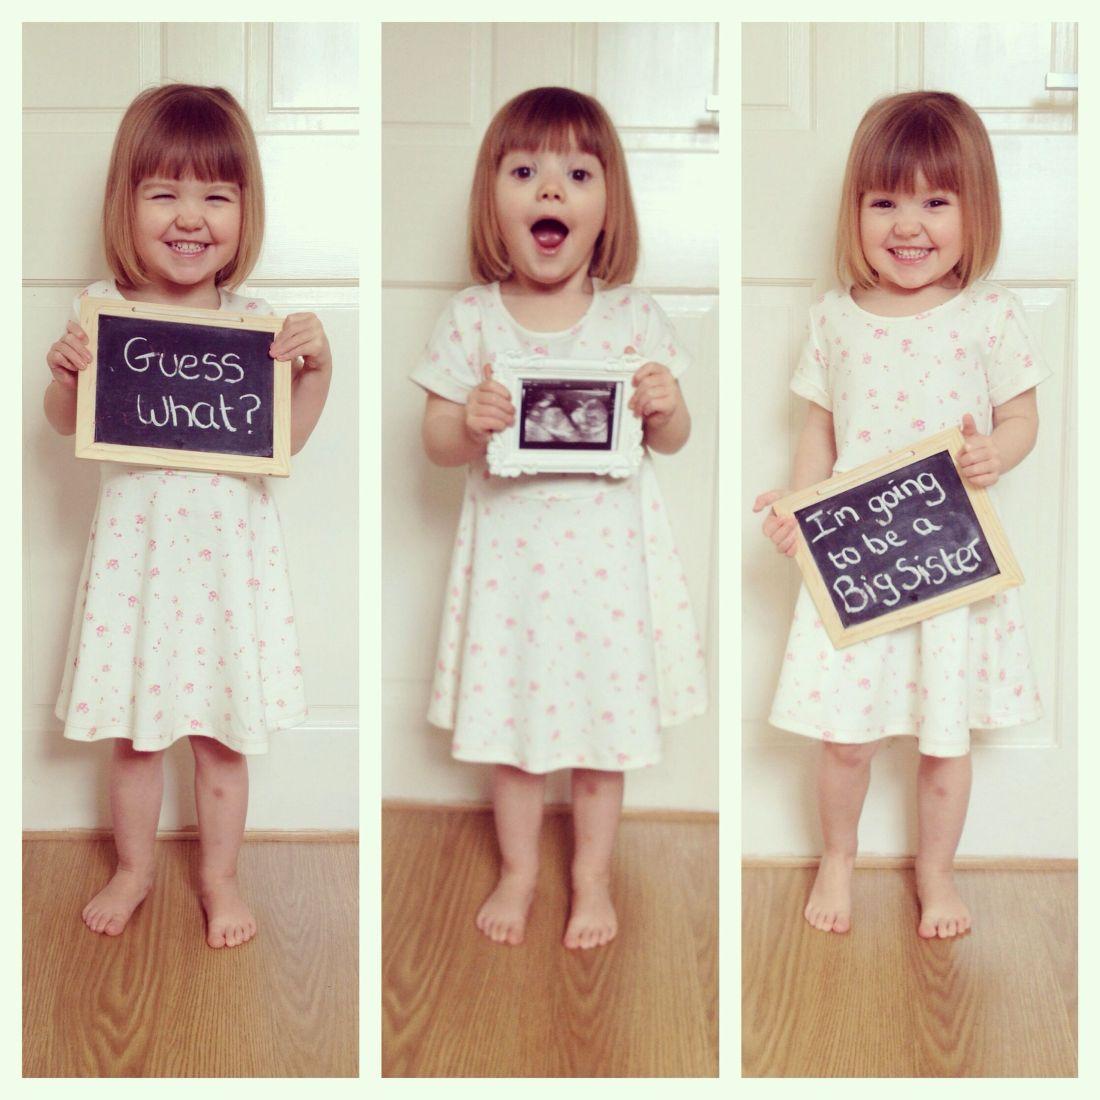 pregnancy announcement gifts ireland